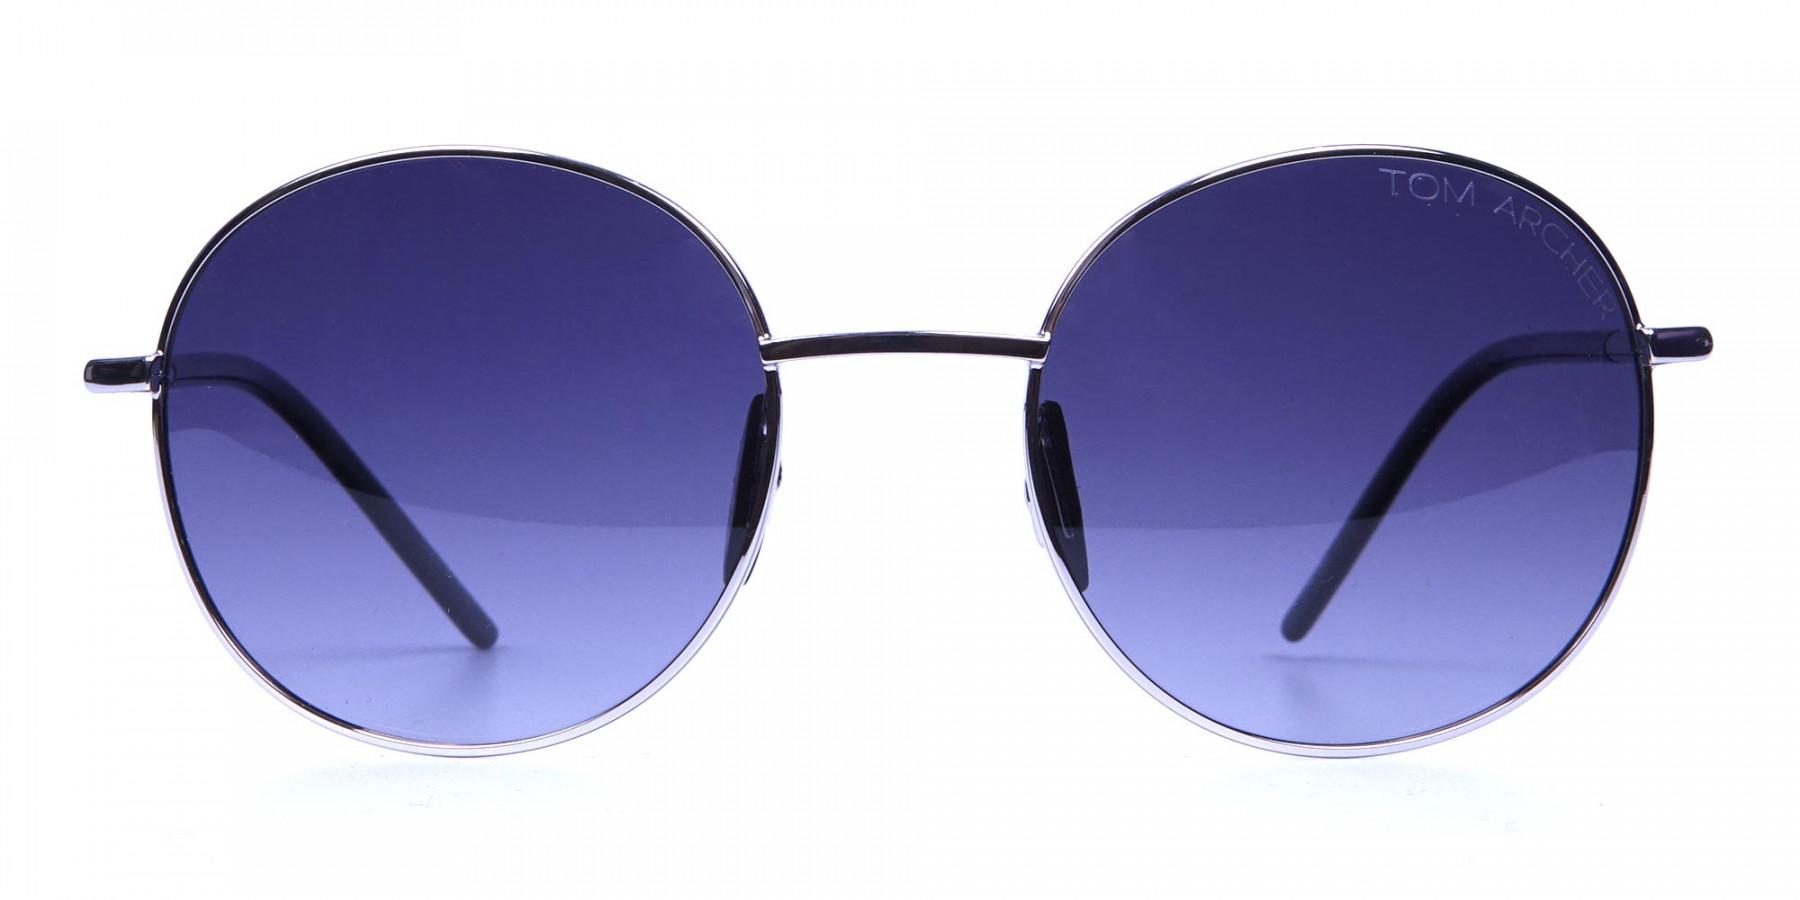 Silver Sunglasses Round Frames -2